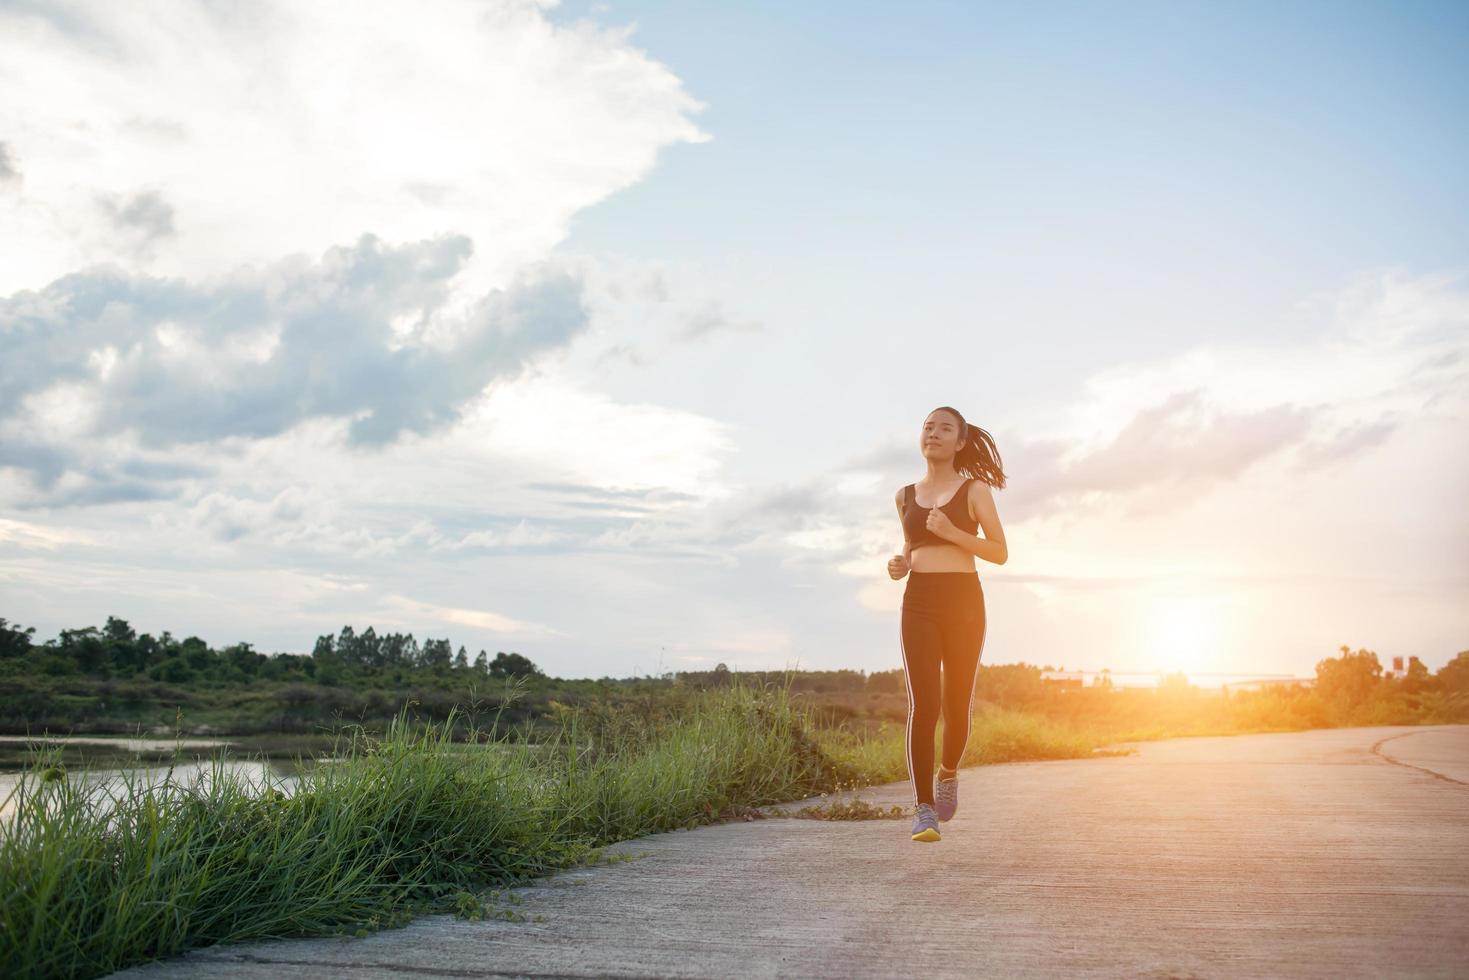 Una joven corredora feliz trotar al aire libre foto